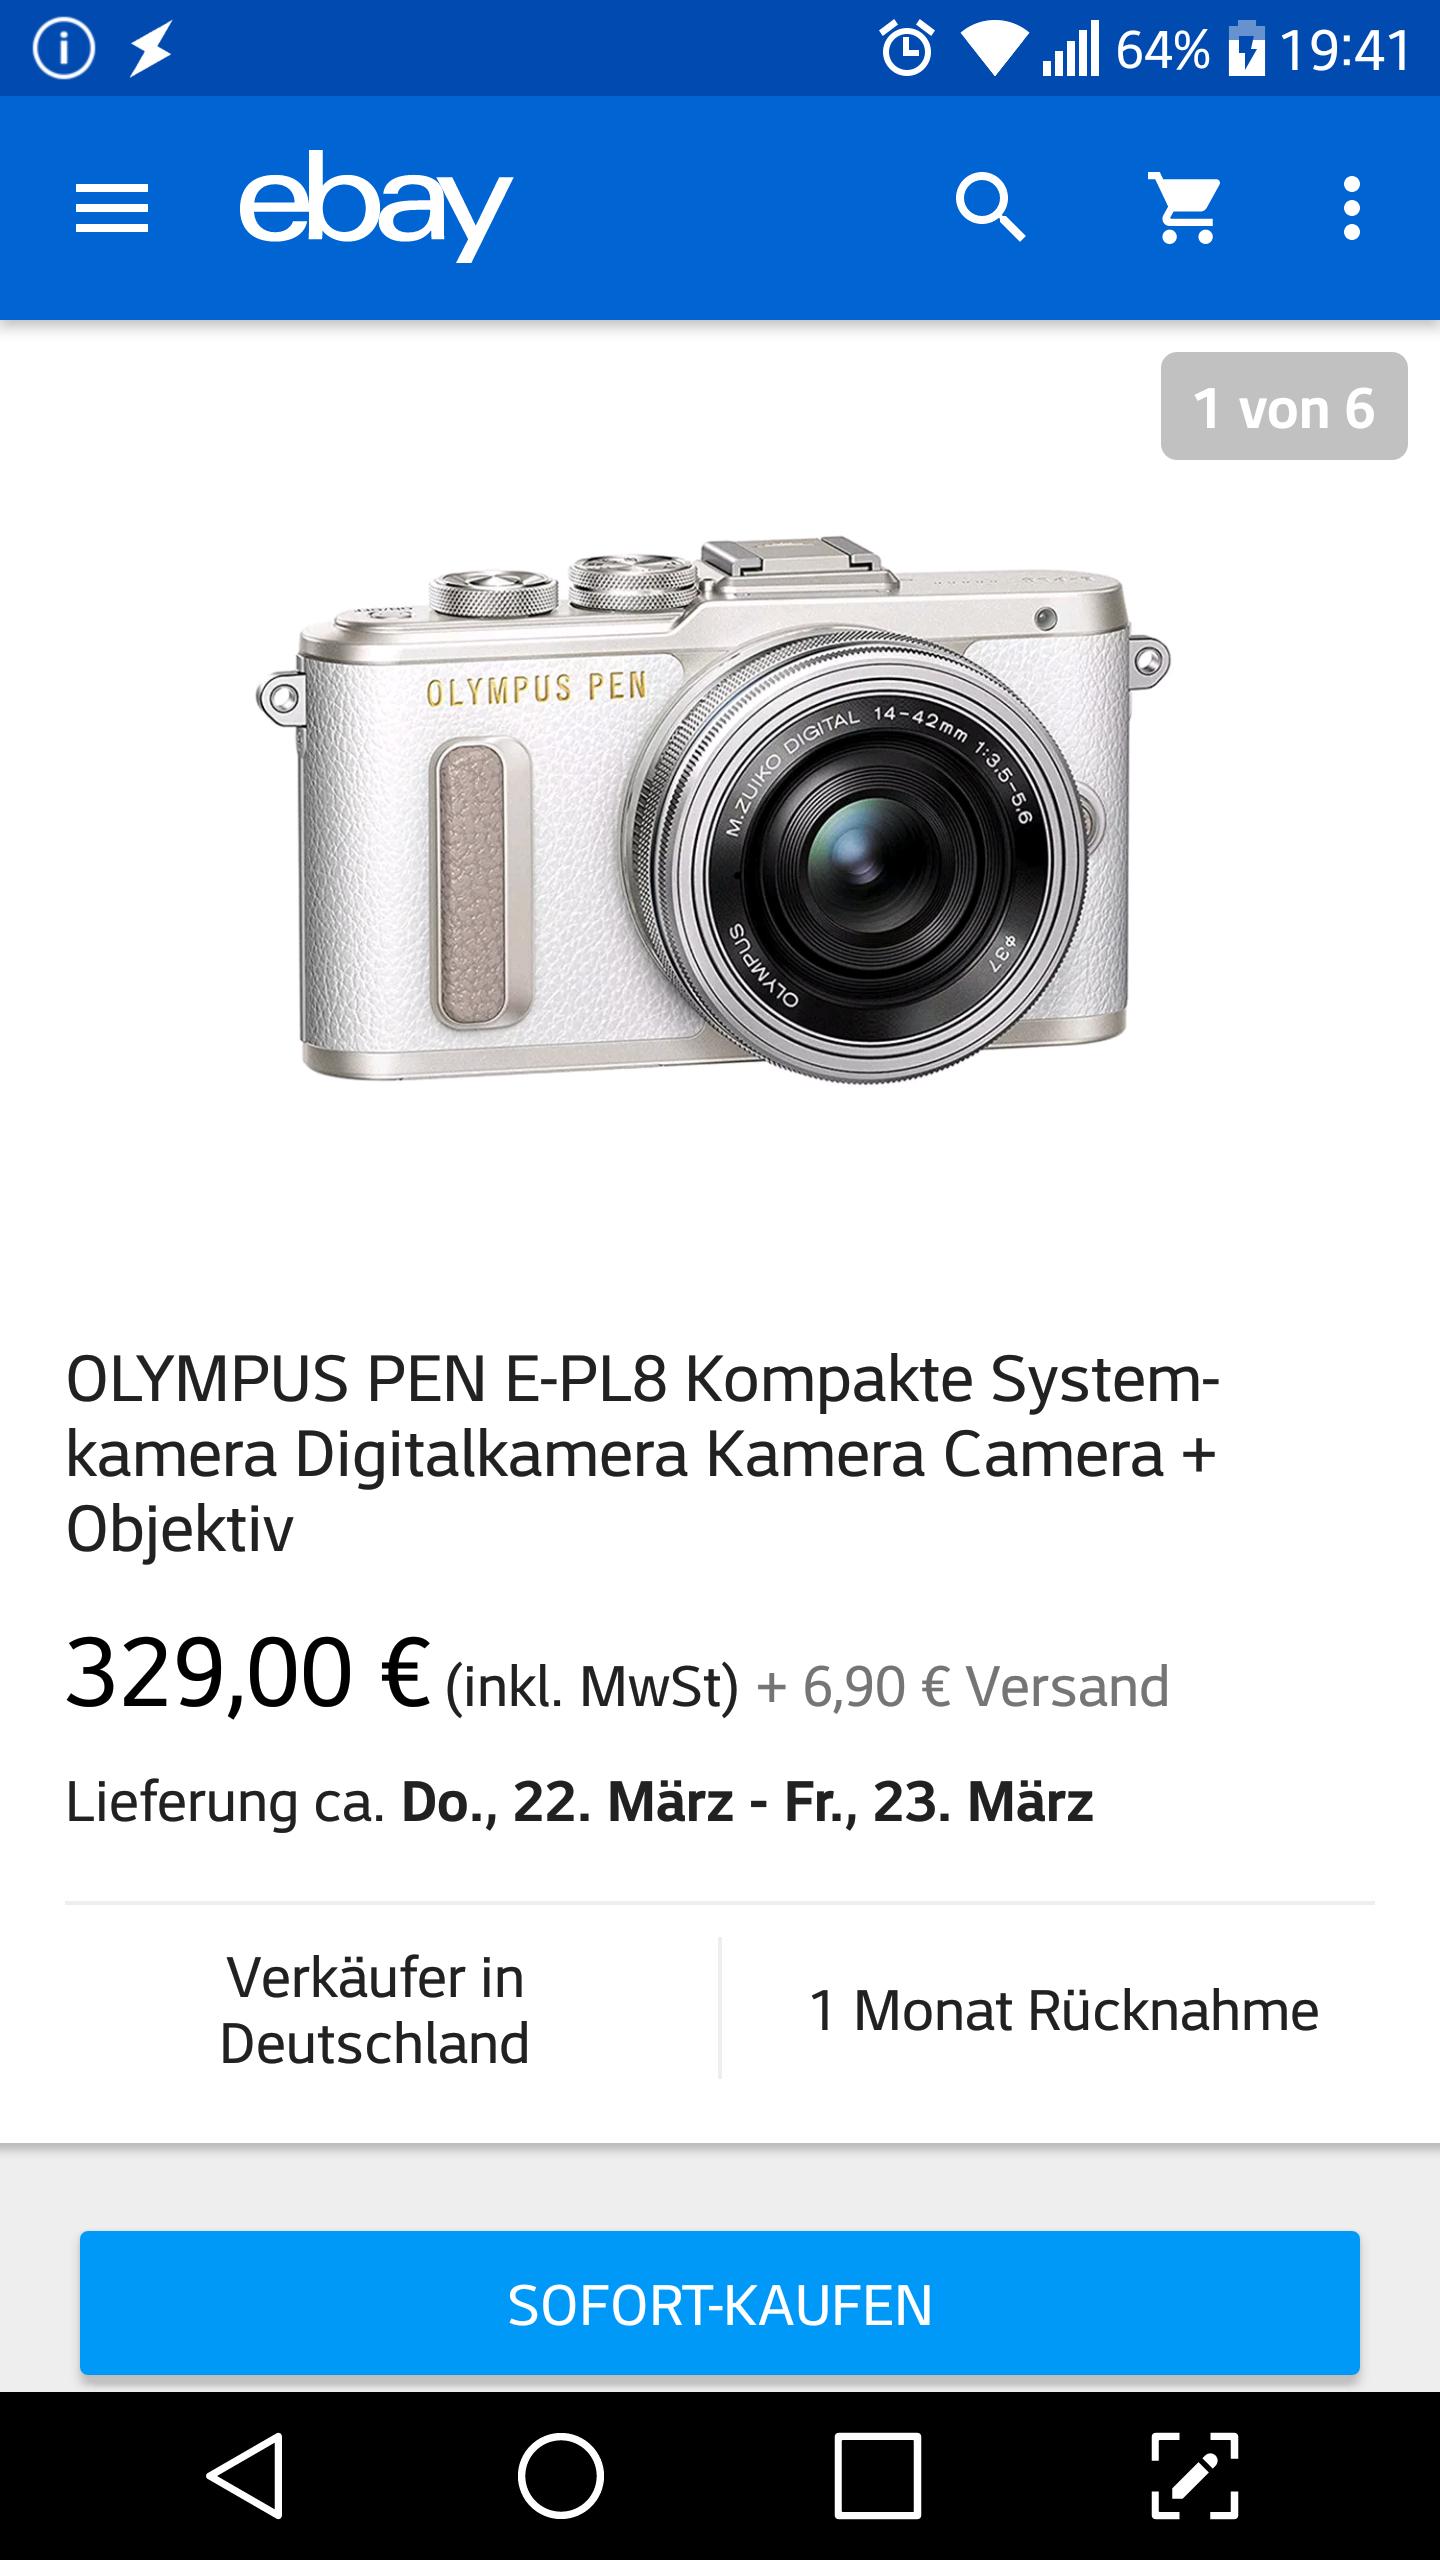 (Ebay) Wie Neu B-Ware/MFT OLYMPUS E-PL8 Systemkamera inkl. 14-42 mm Objektiv